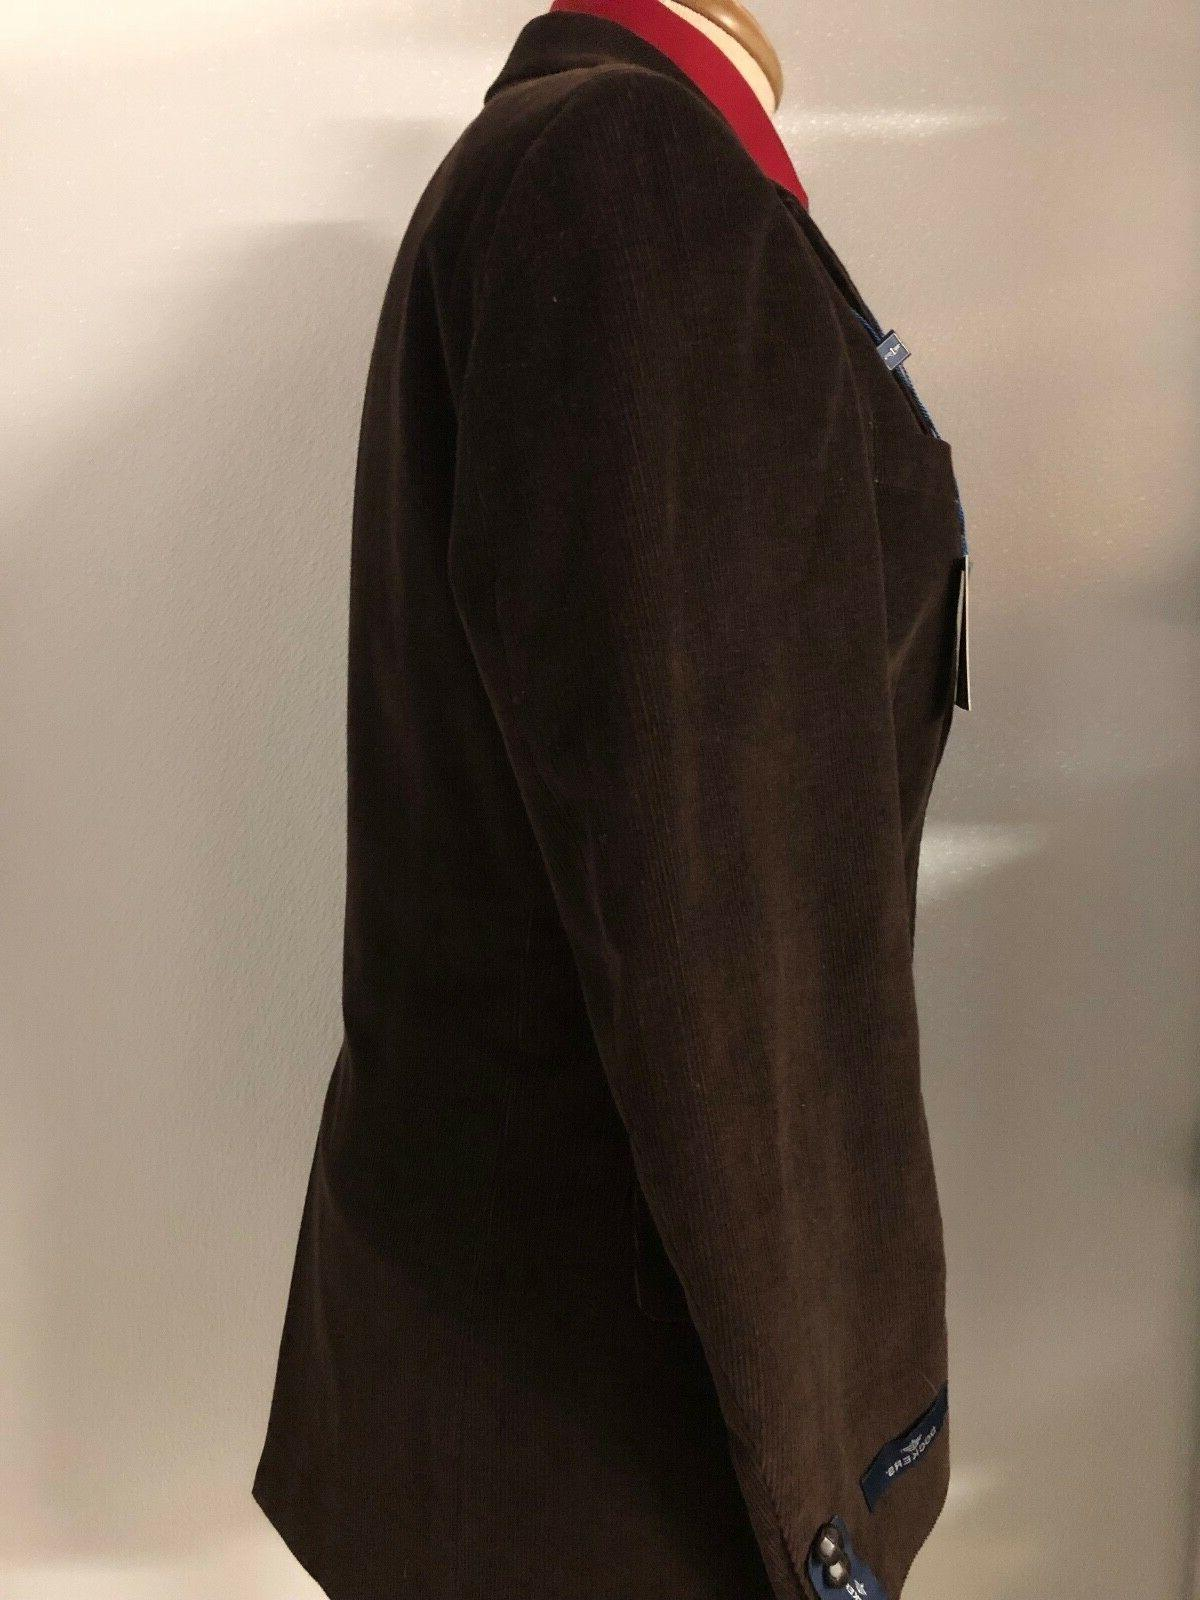 DOCKERS *NEW* BROWN Suit NEW